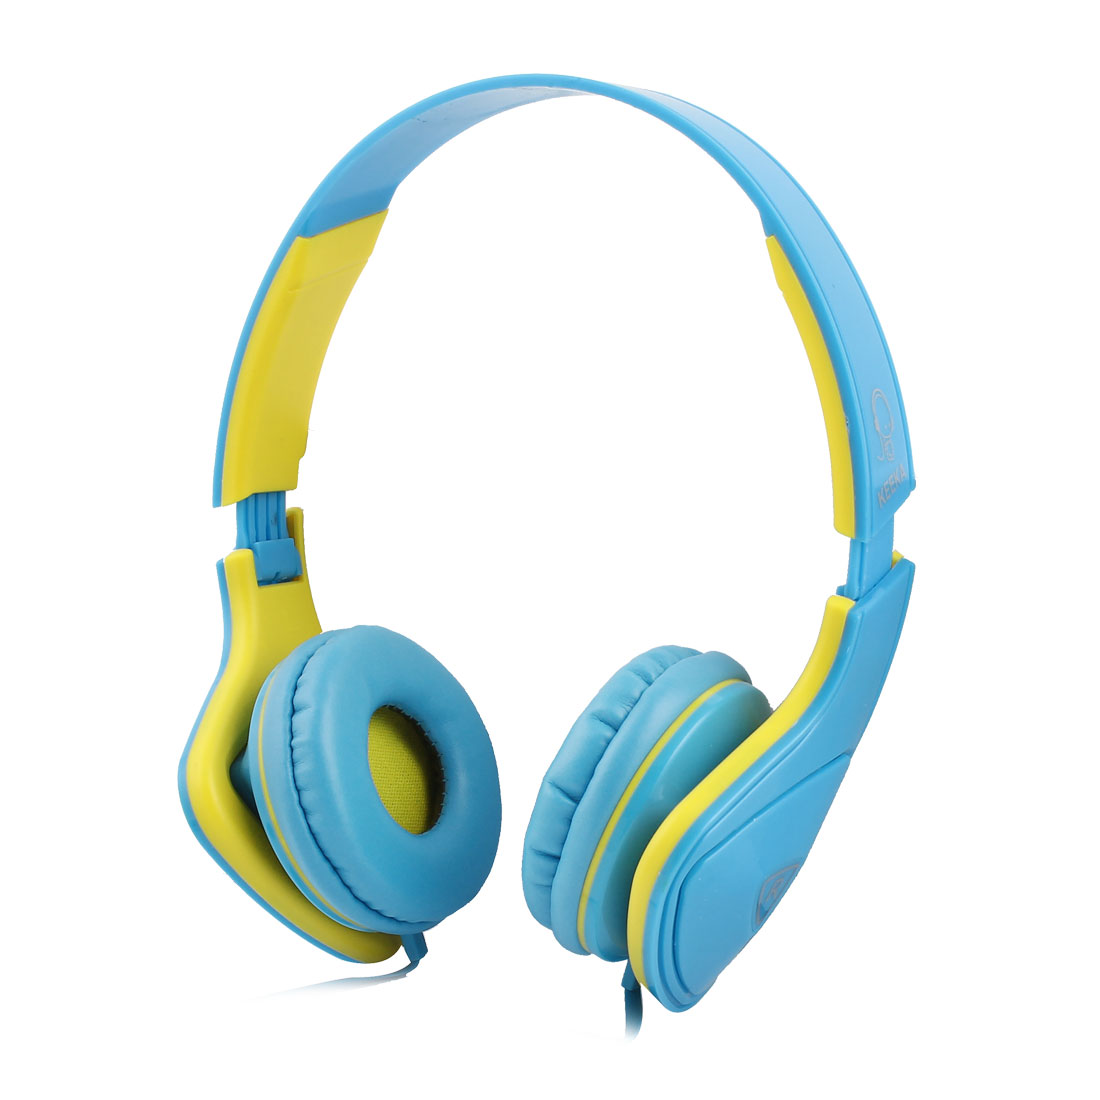 Authorized KEEKA Adjustable Headband 3.5mm Plug Stereo Mic Headphone Headset for PC Laptop